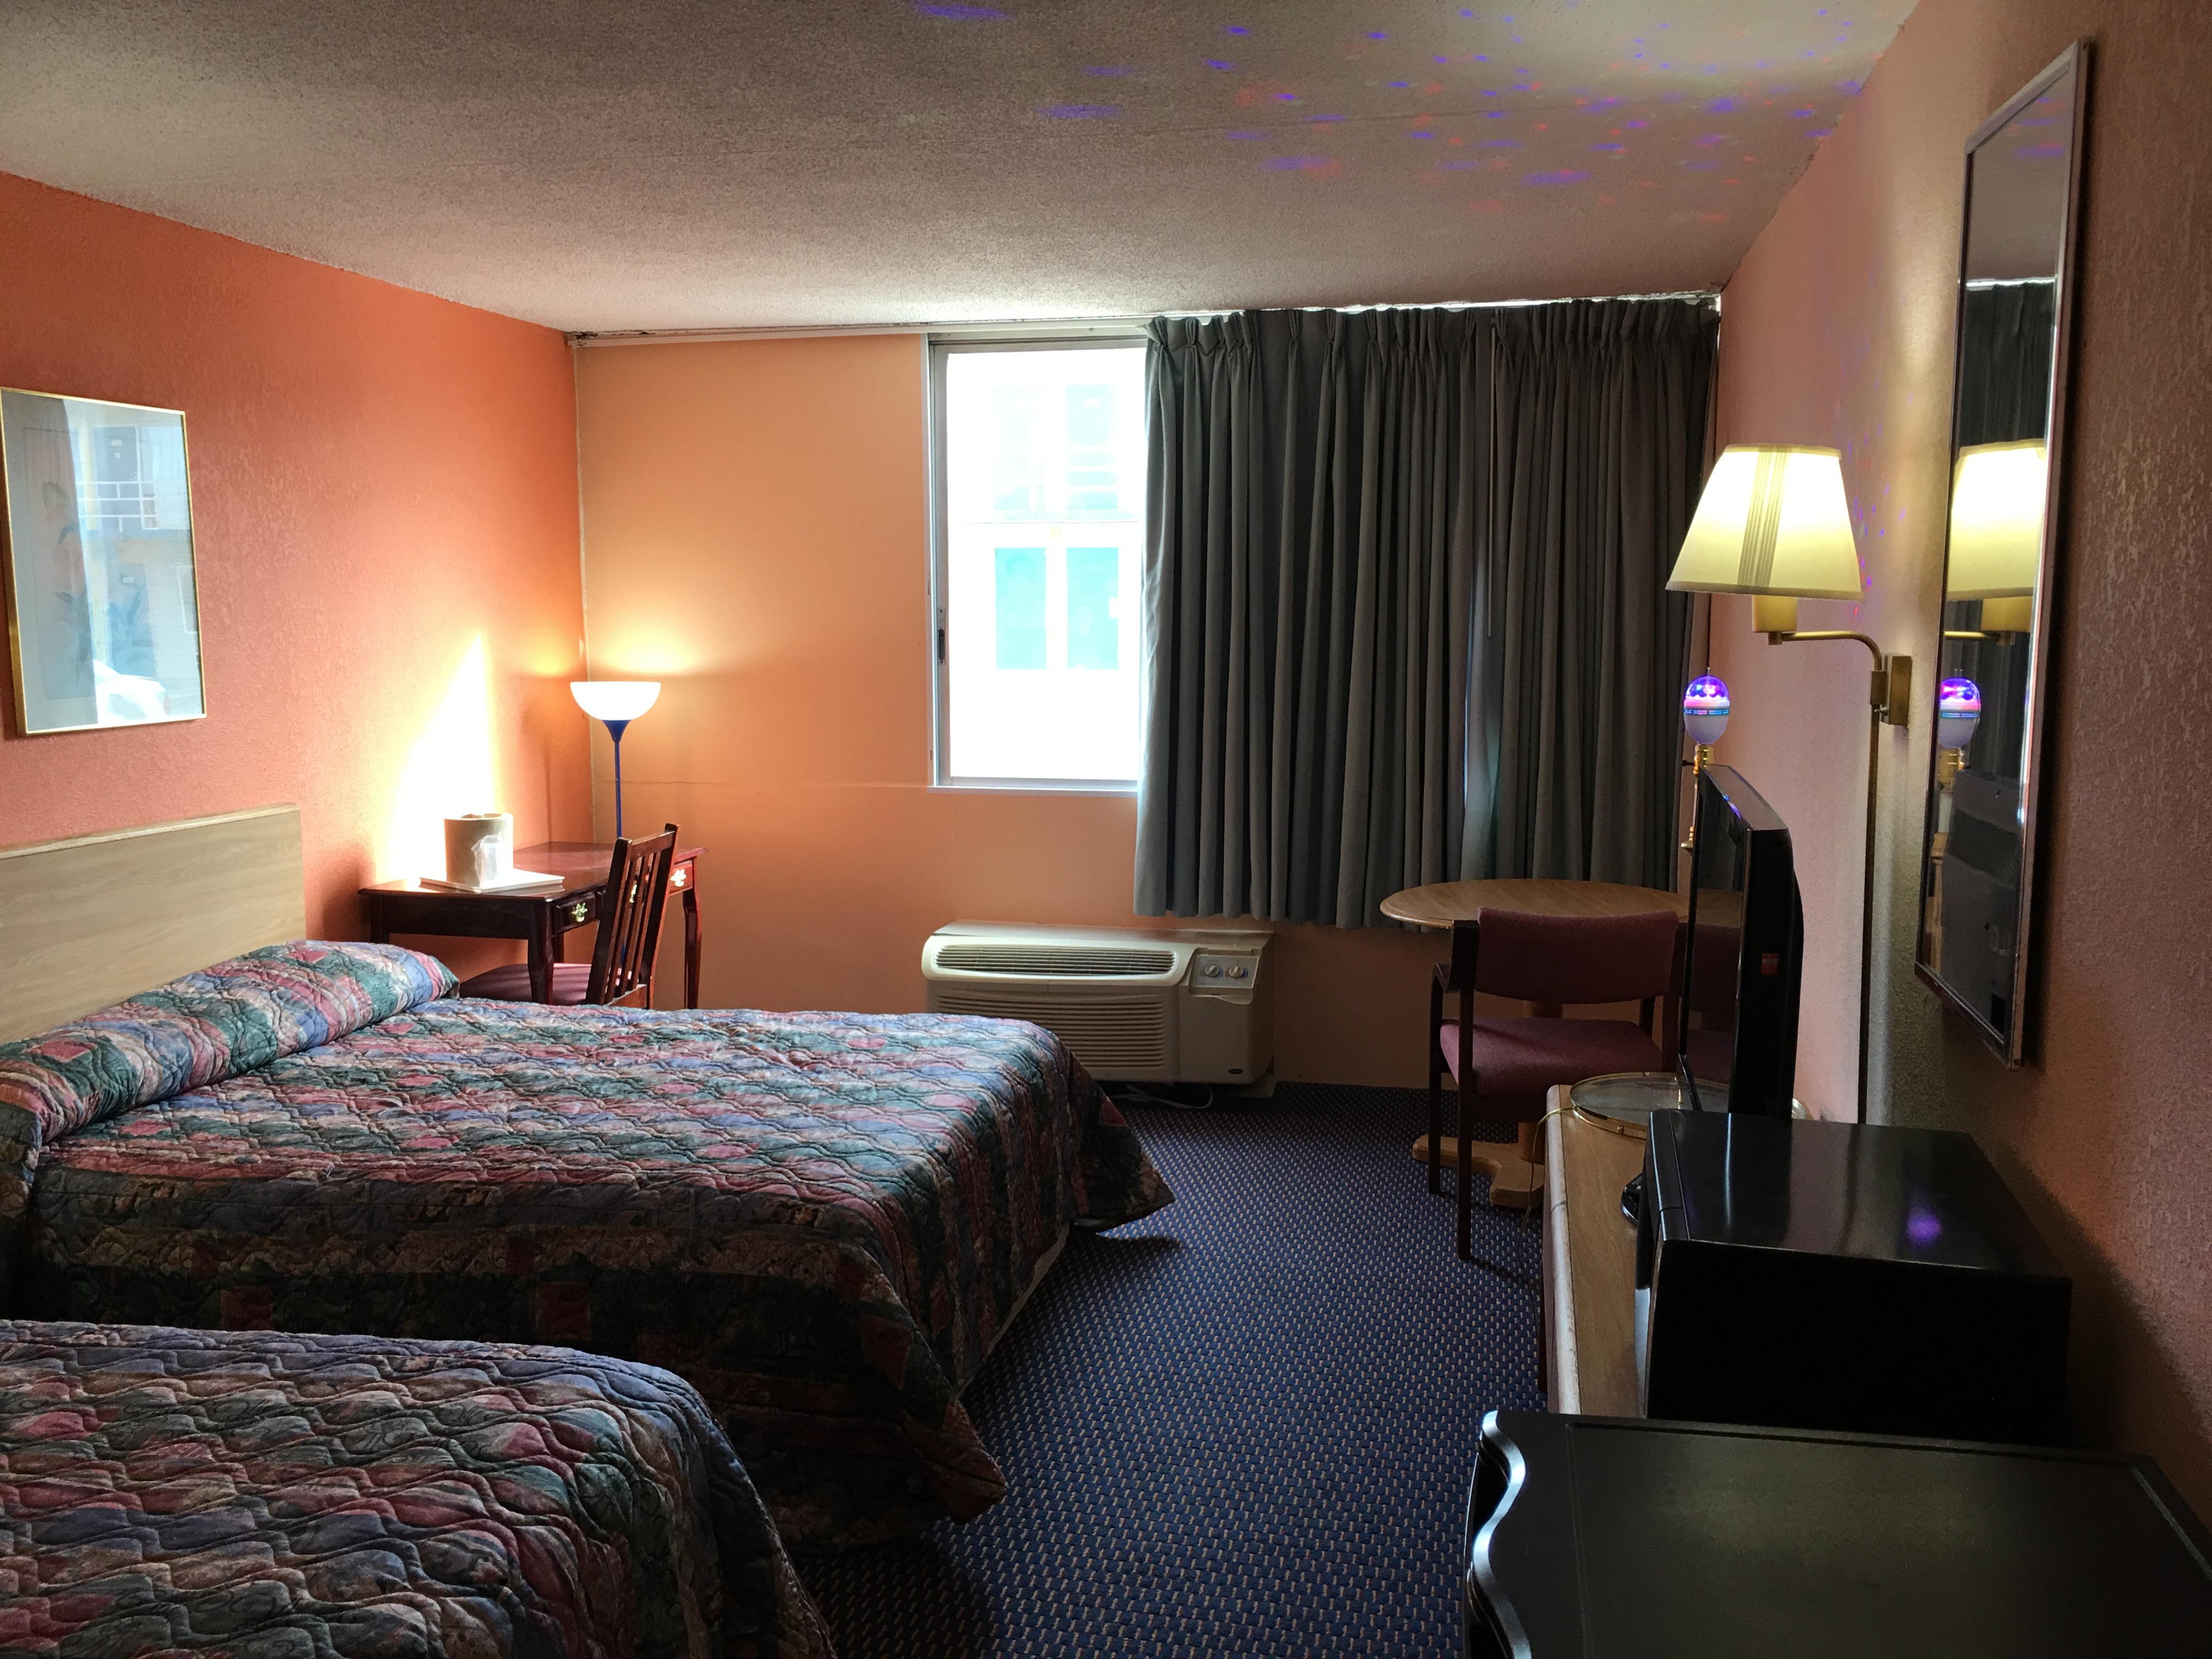 Red Carpet Inn & Suites image 16